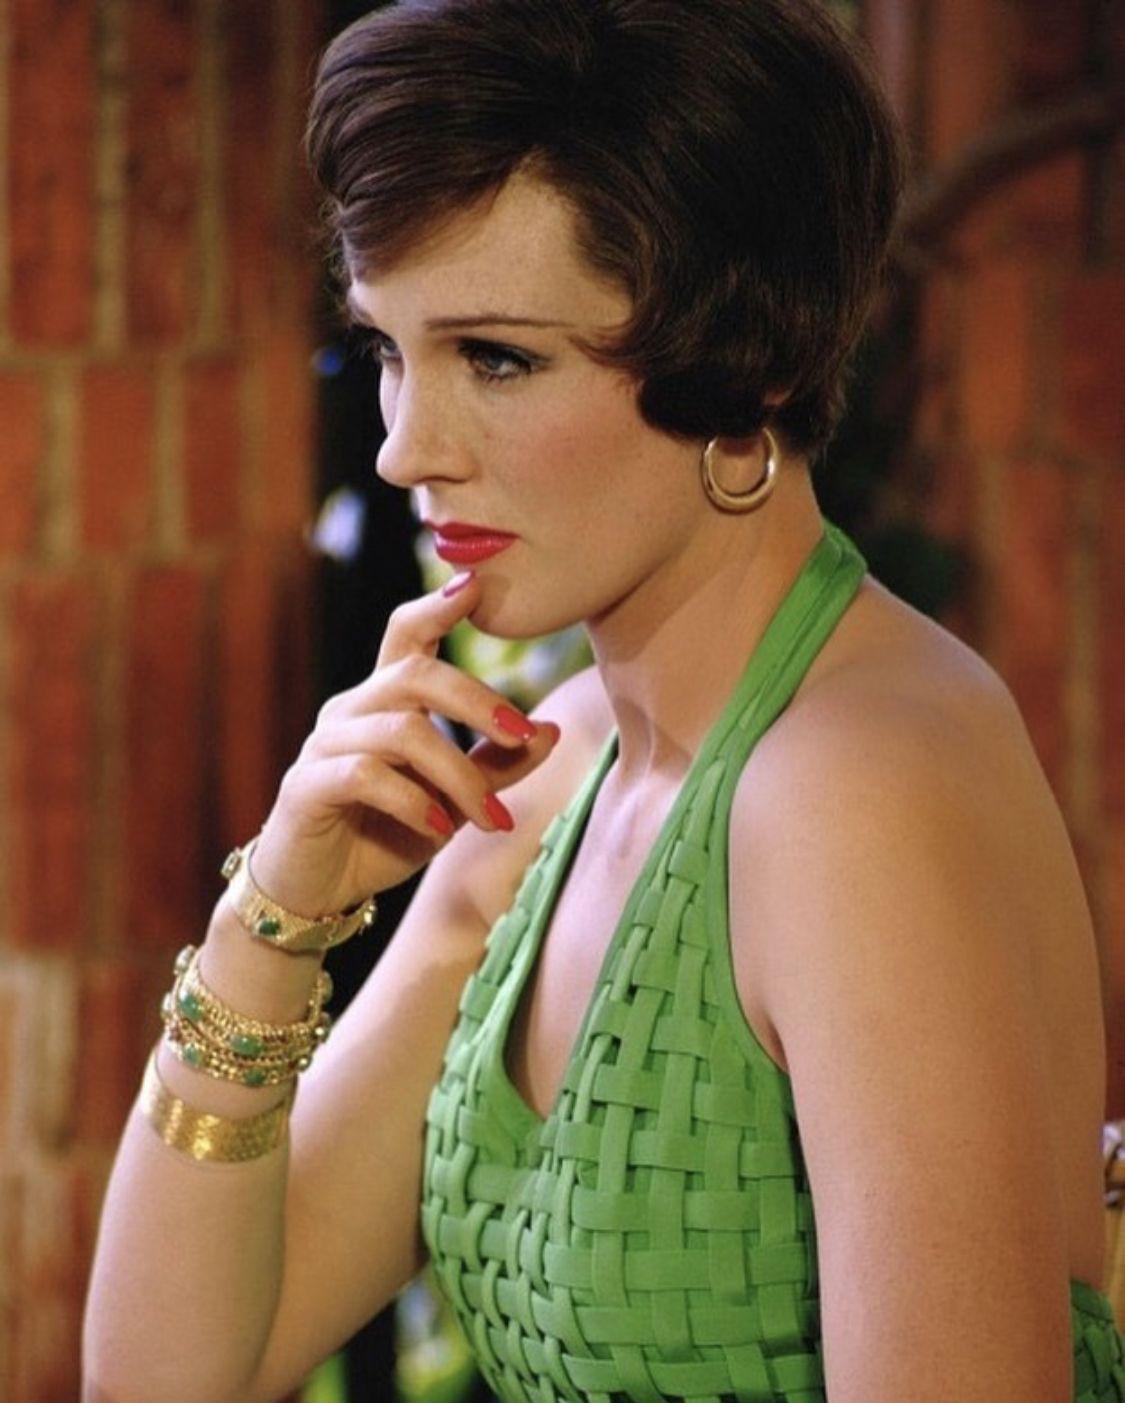 Julie Andrews in 2020 | Julie andrews, Andrews, Actresses